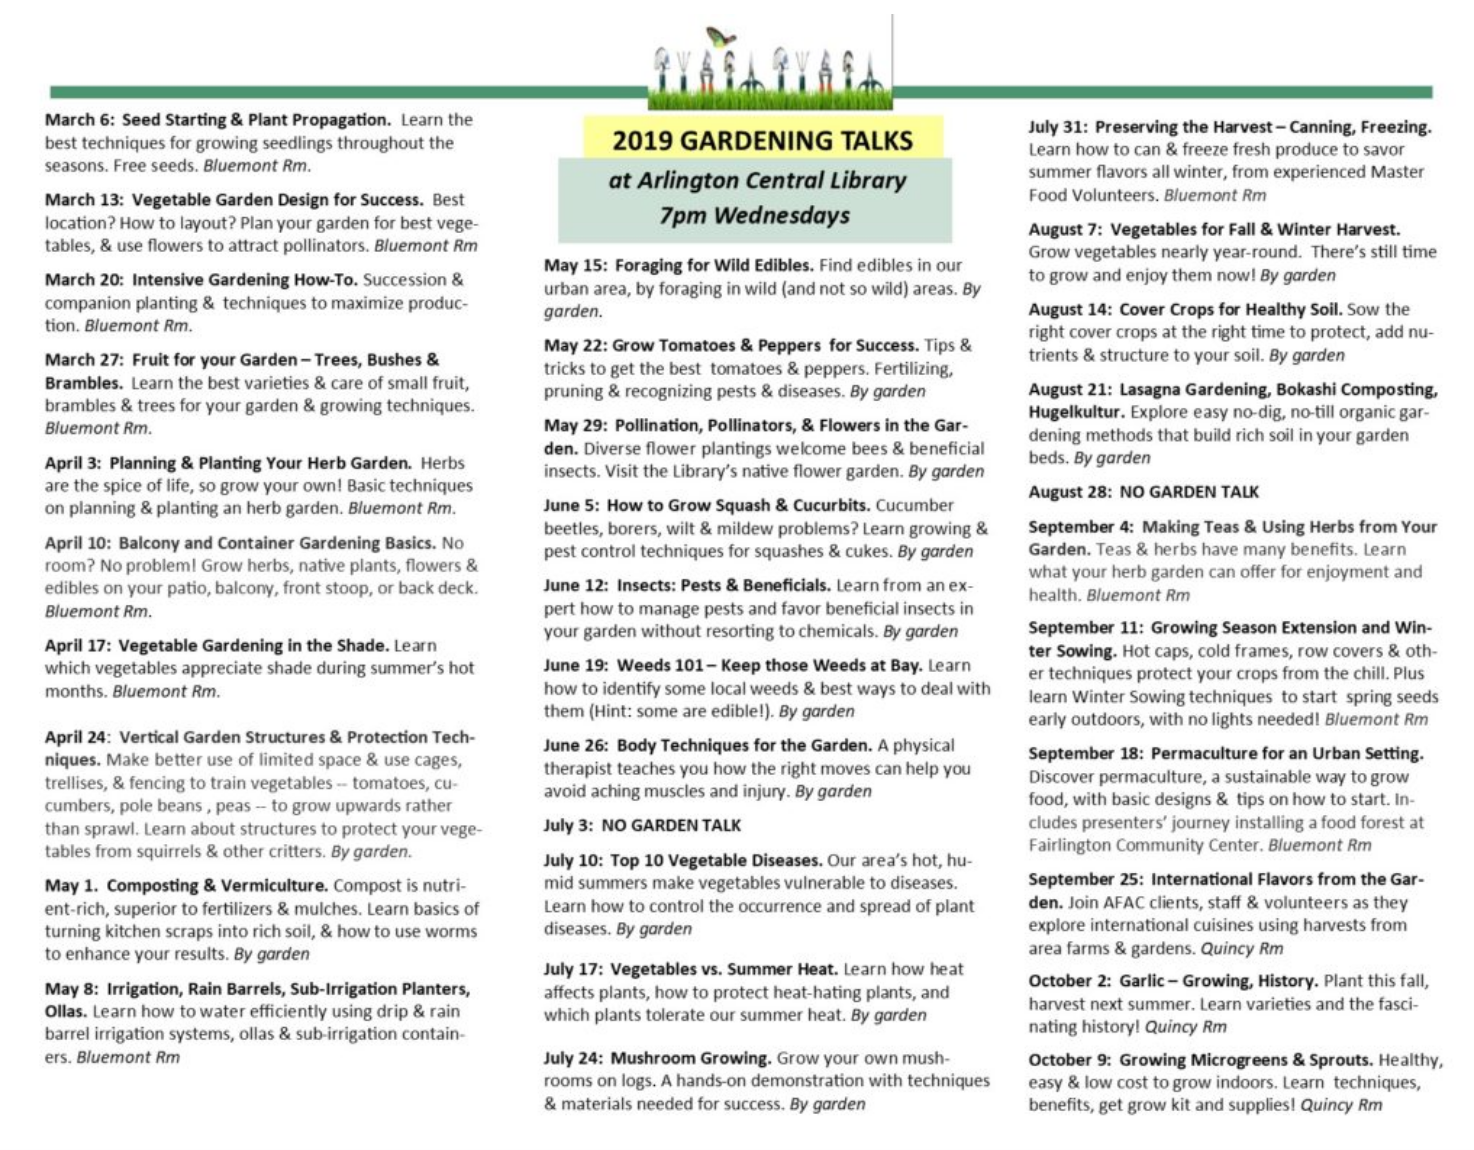 DUG Network July Urban Gardener Newsletter - Melvin Hazen Community